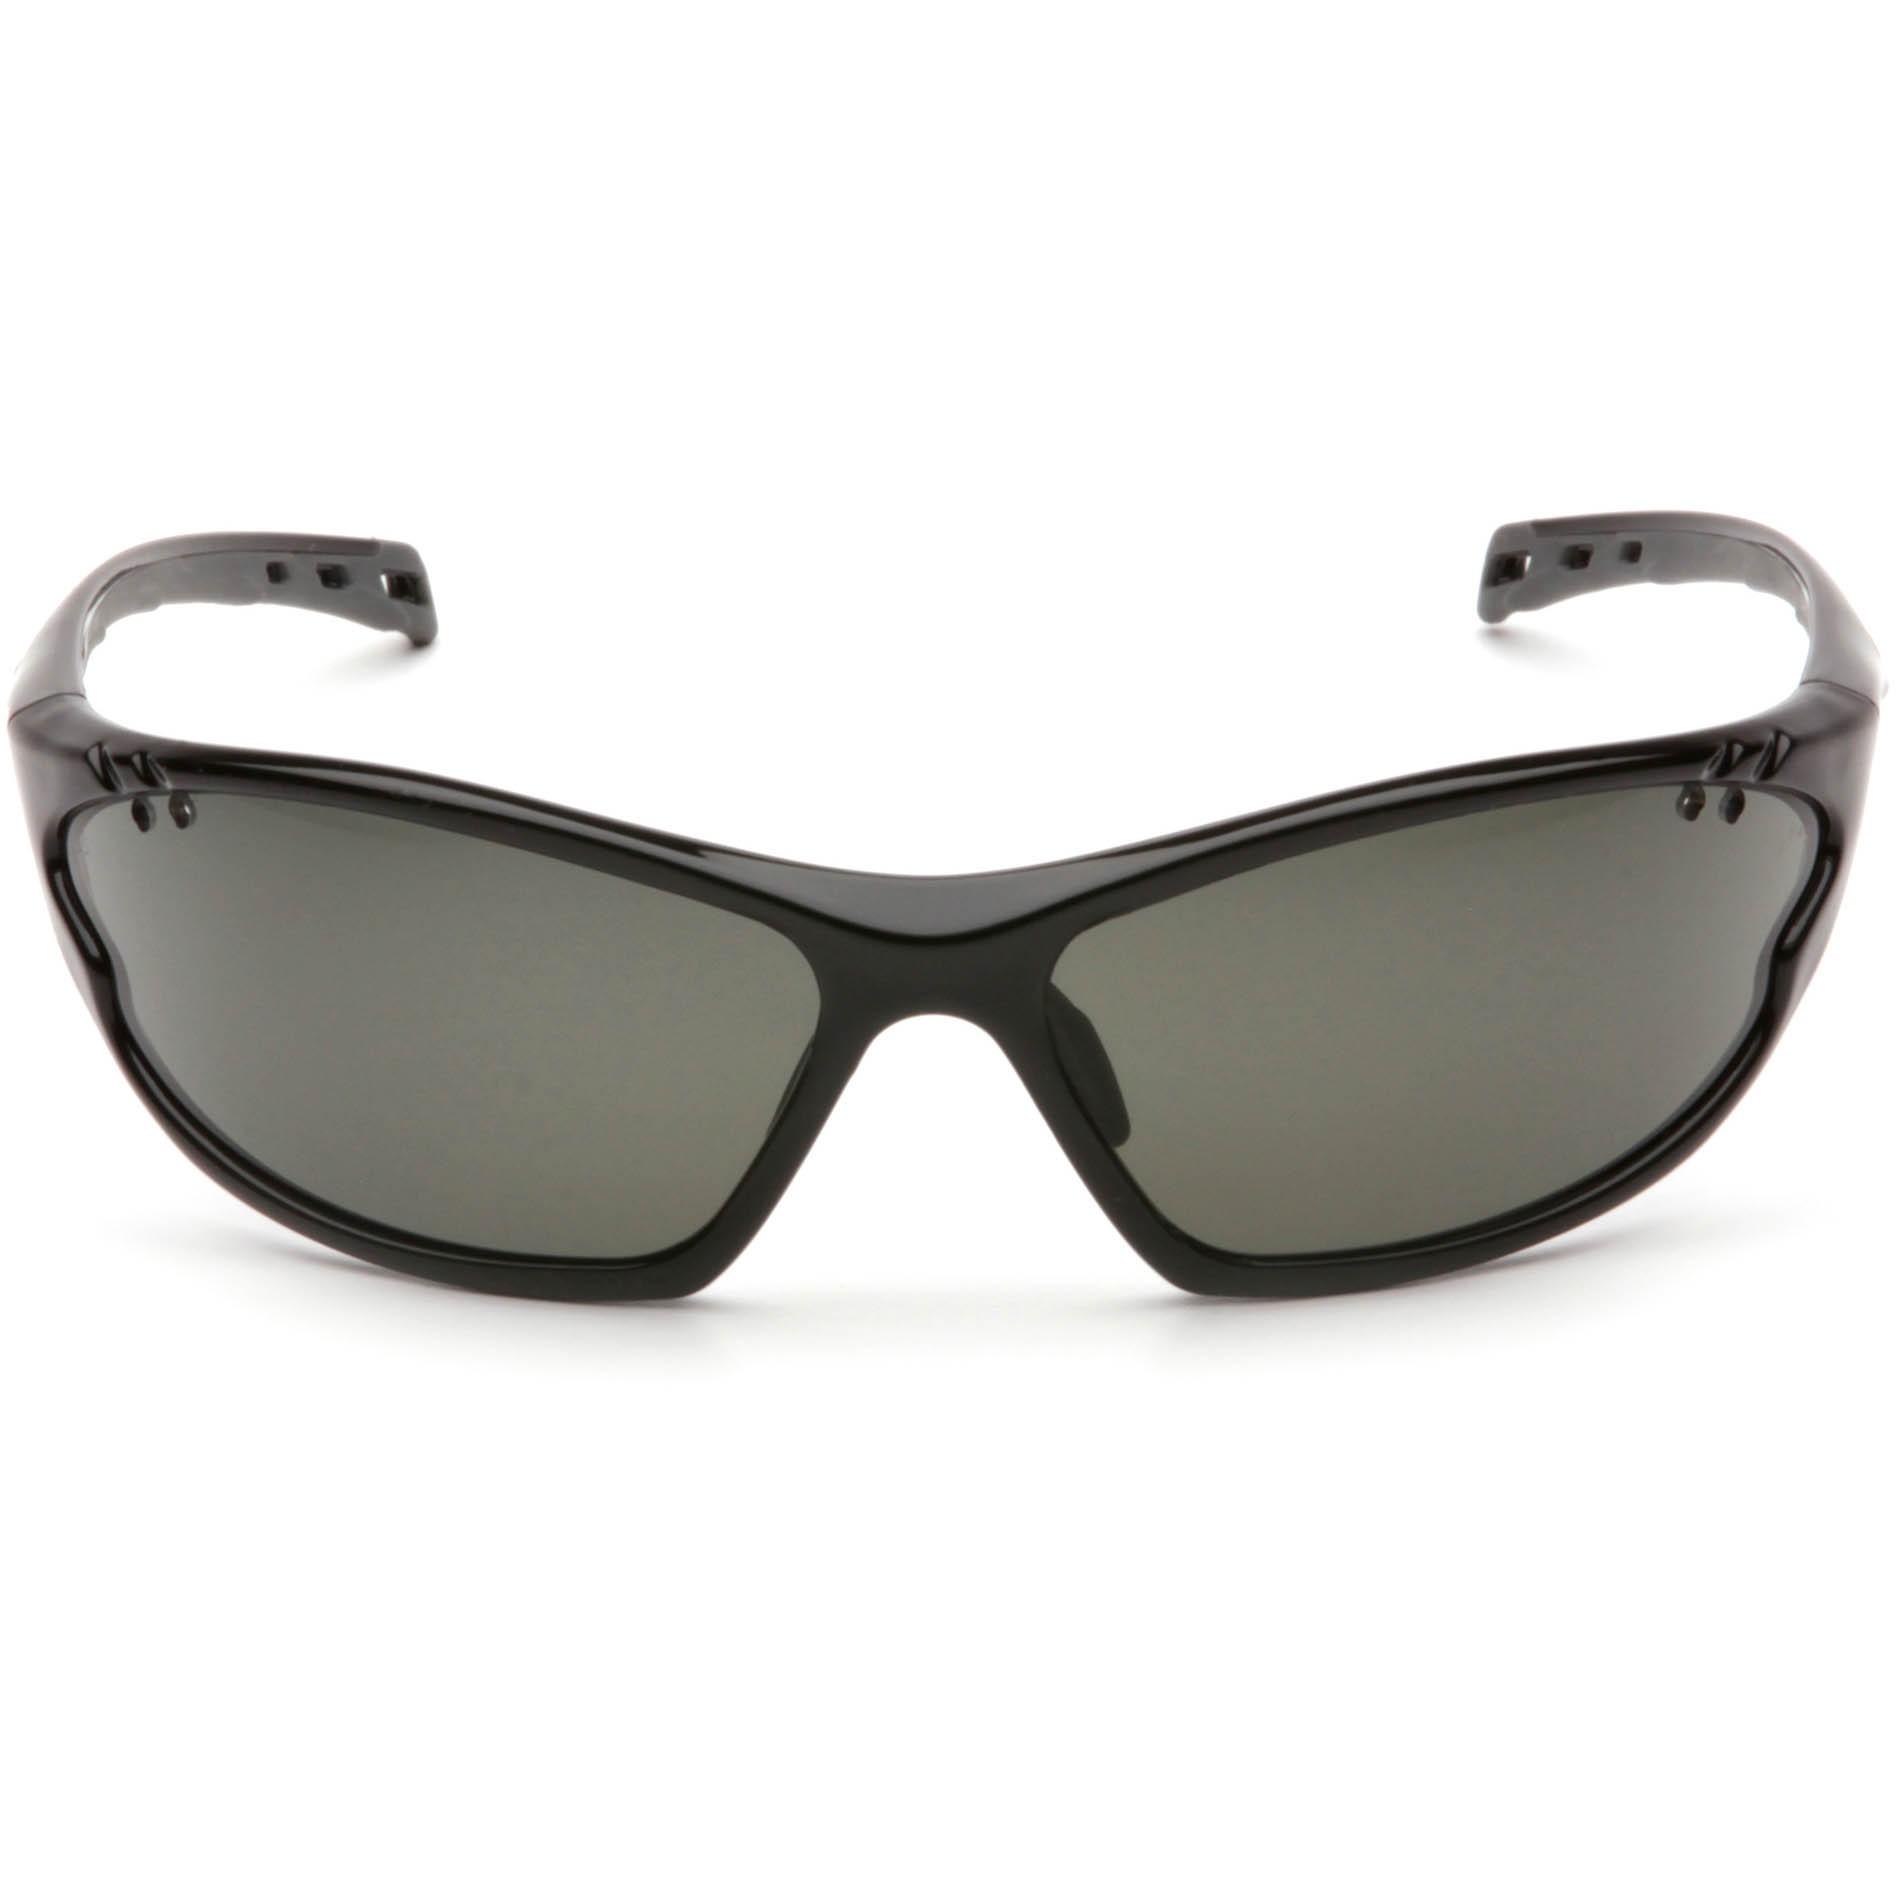 45b9738fef408 Polarized Bifocal Safety Sunglasses